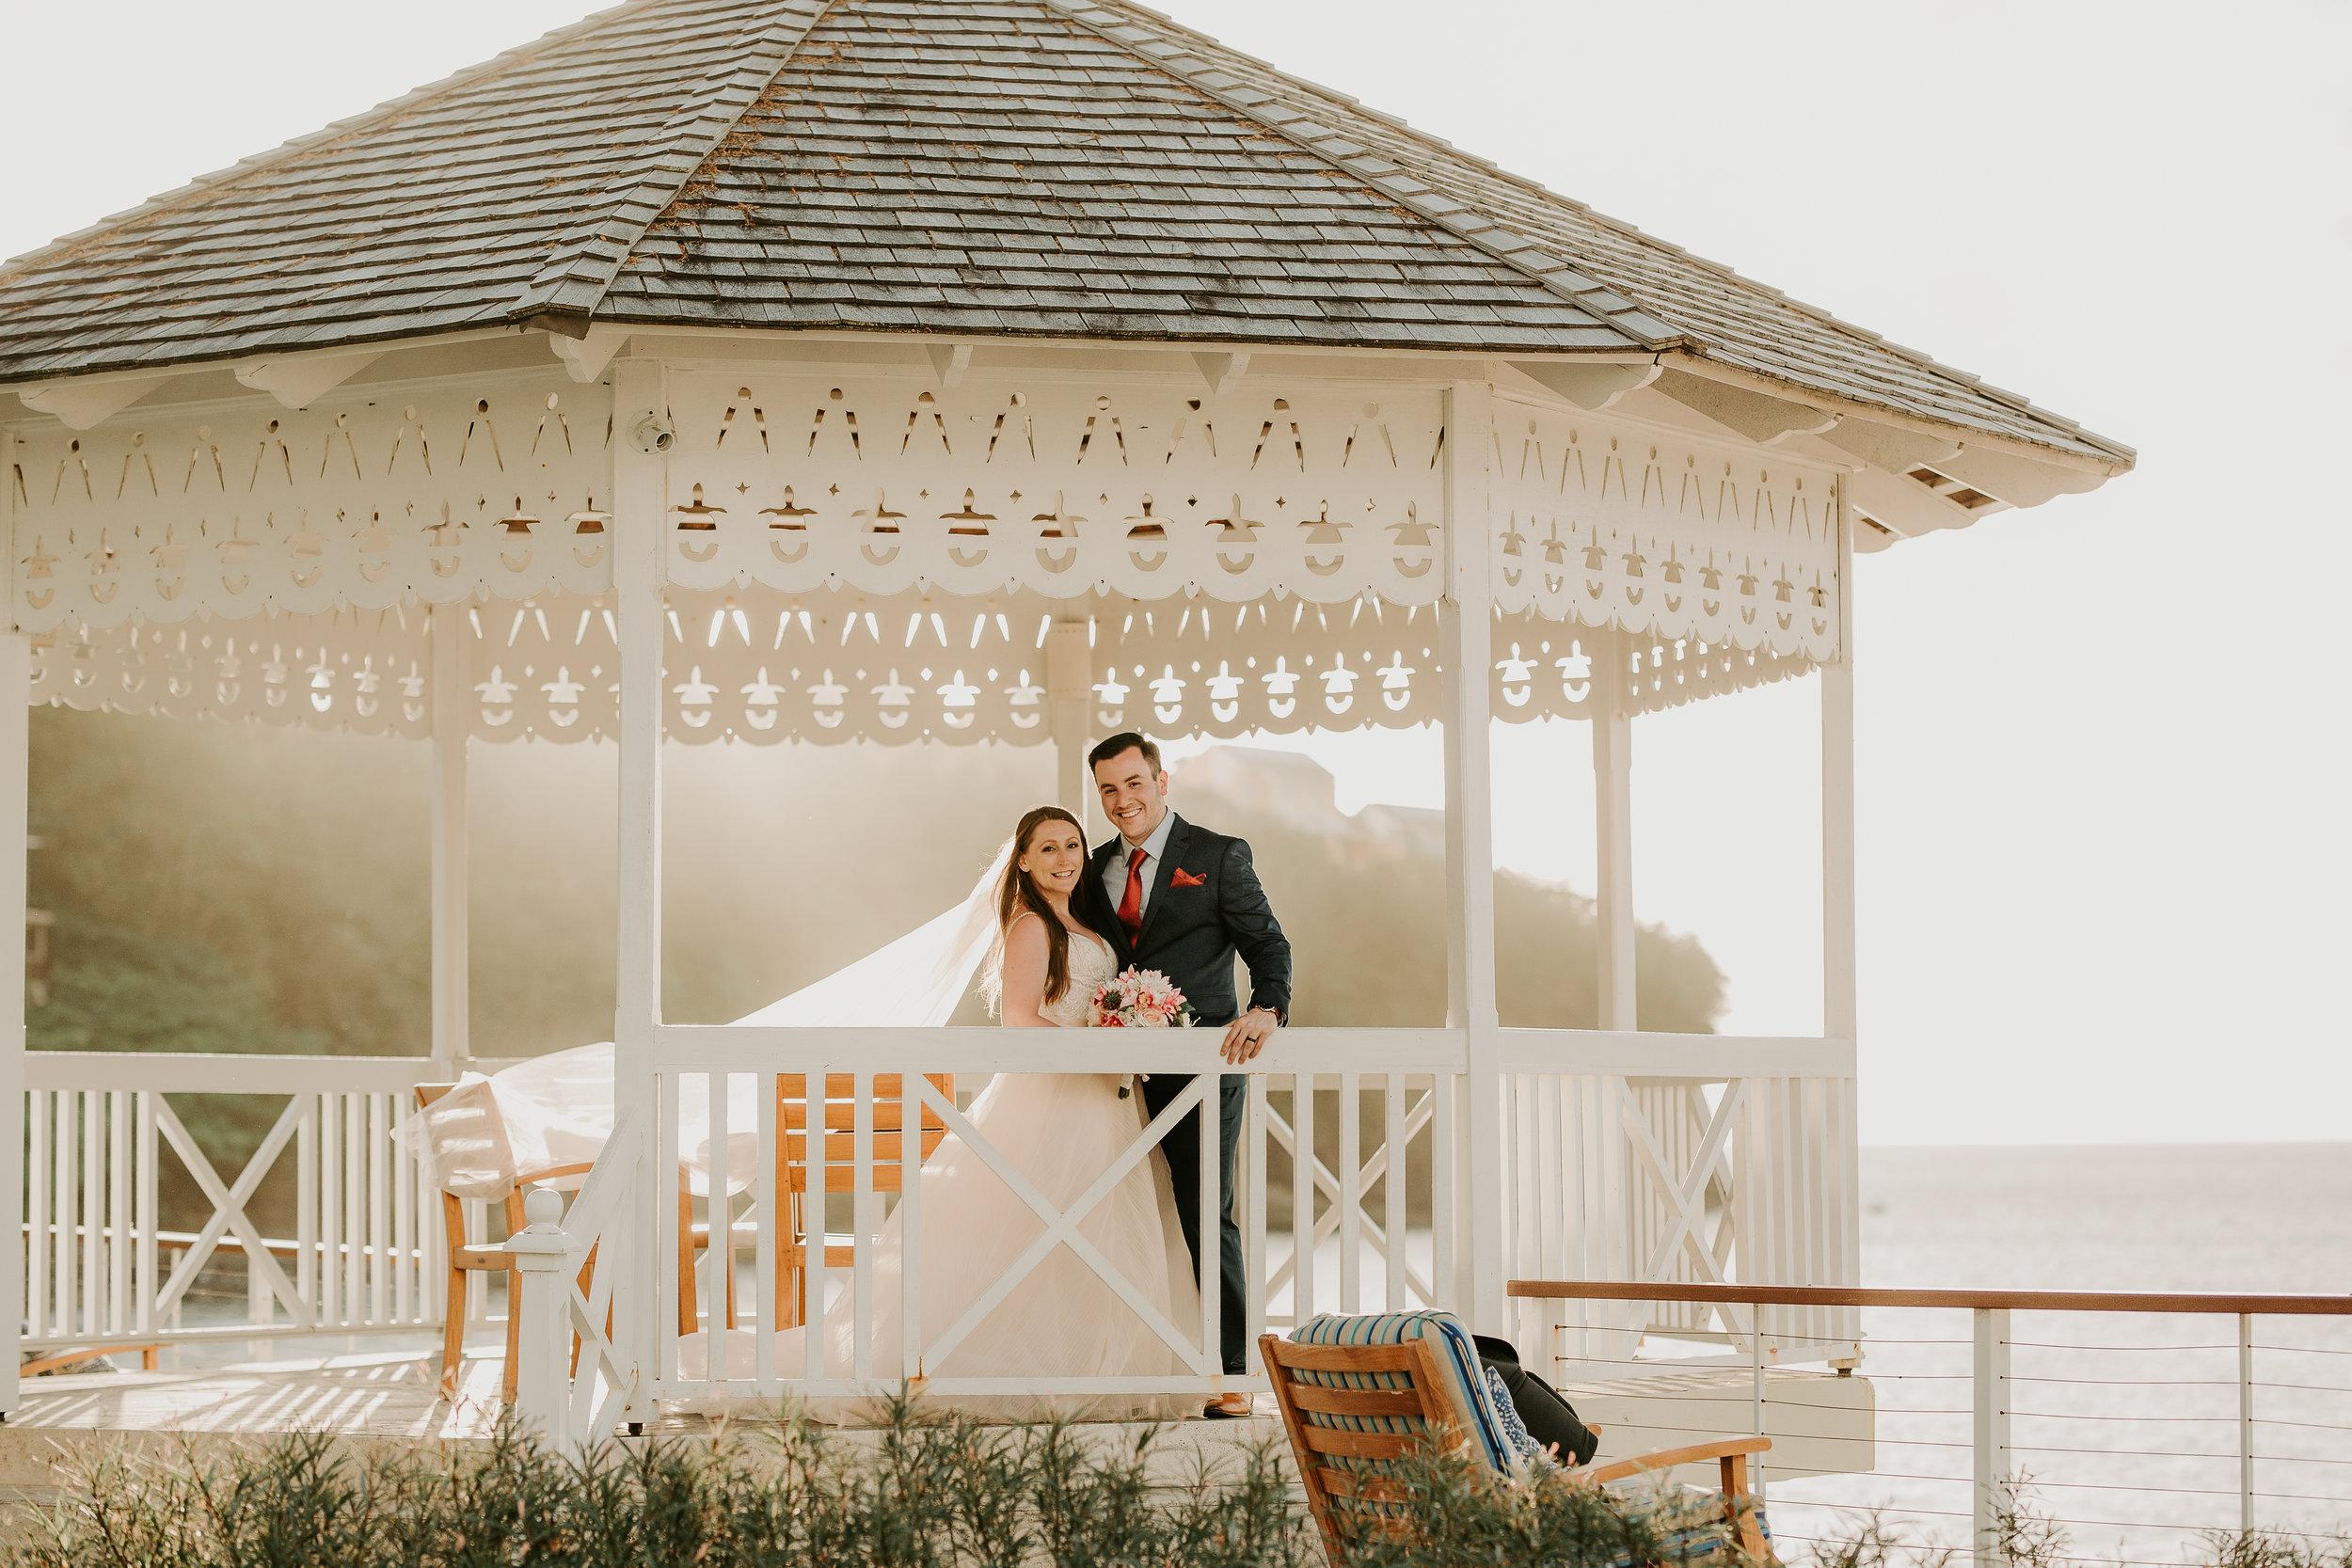 nicole-daacke-photography-destination-wedding-in-st-lucia-sandals-la-toc-intimate-island-wedding-carribean-elopement-photographer-chill-island-wedding-112.jpg